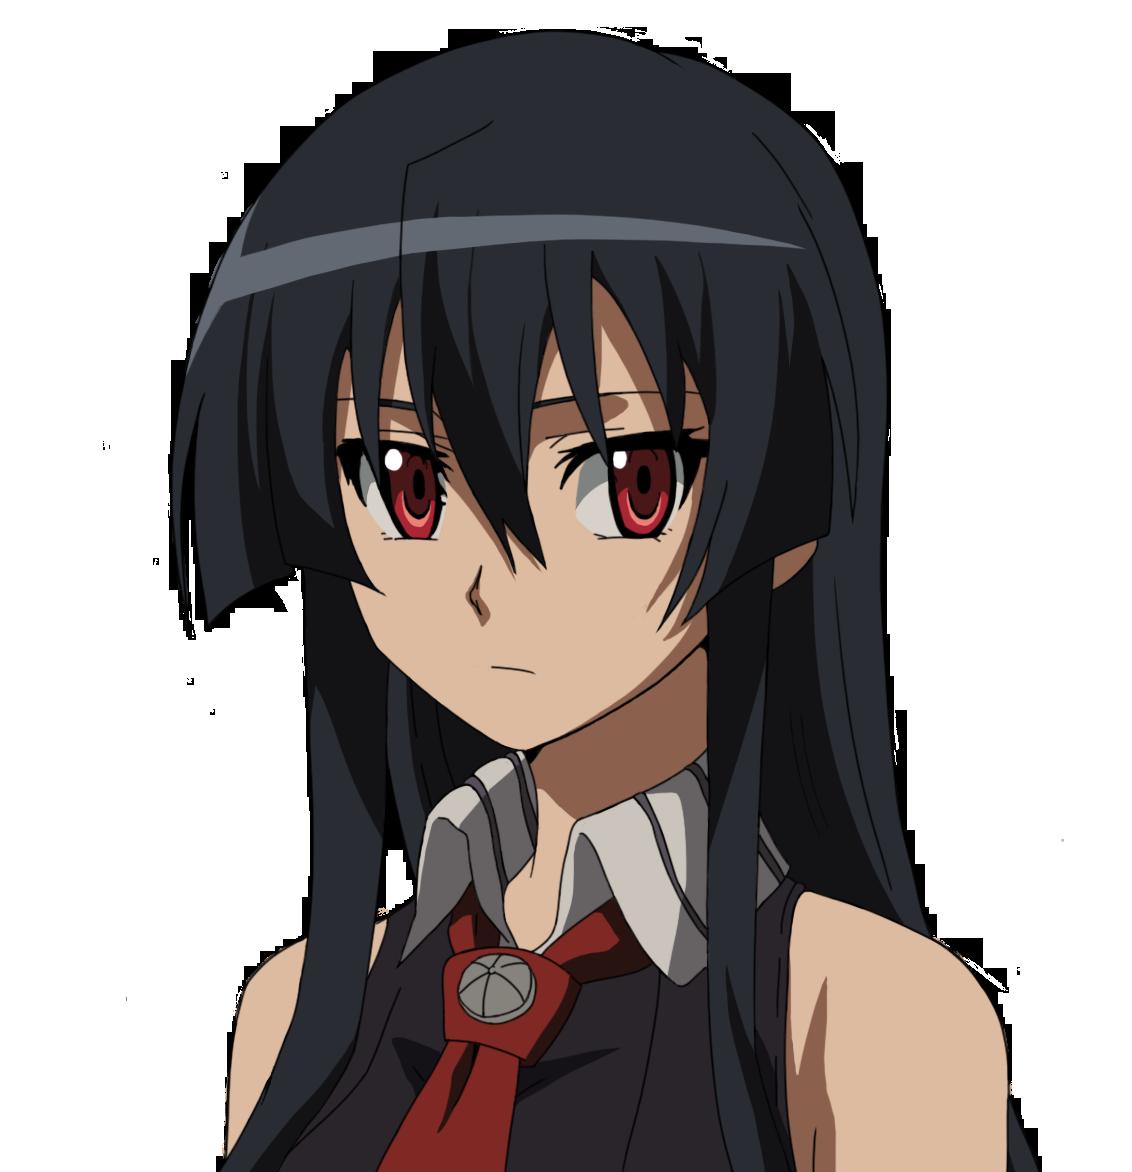 Manga Denizi Akame Ga Kill: Akame By Jay3009 On DeviantArt